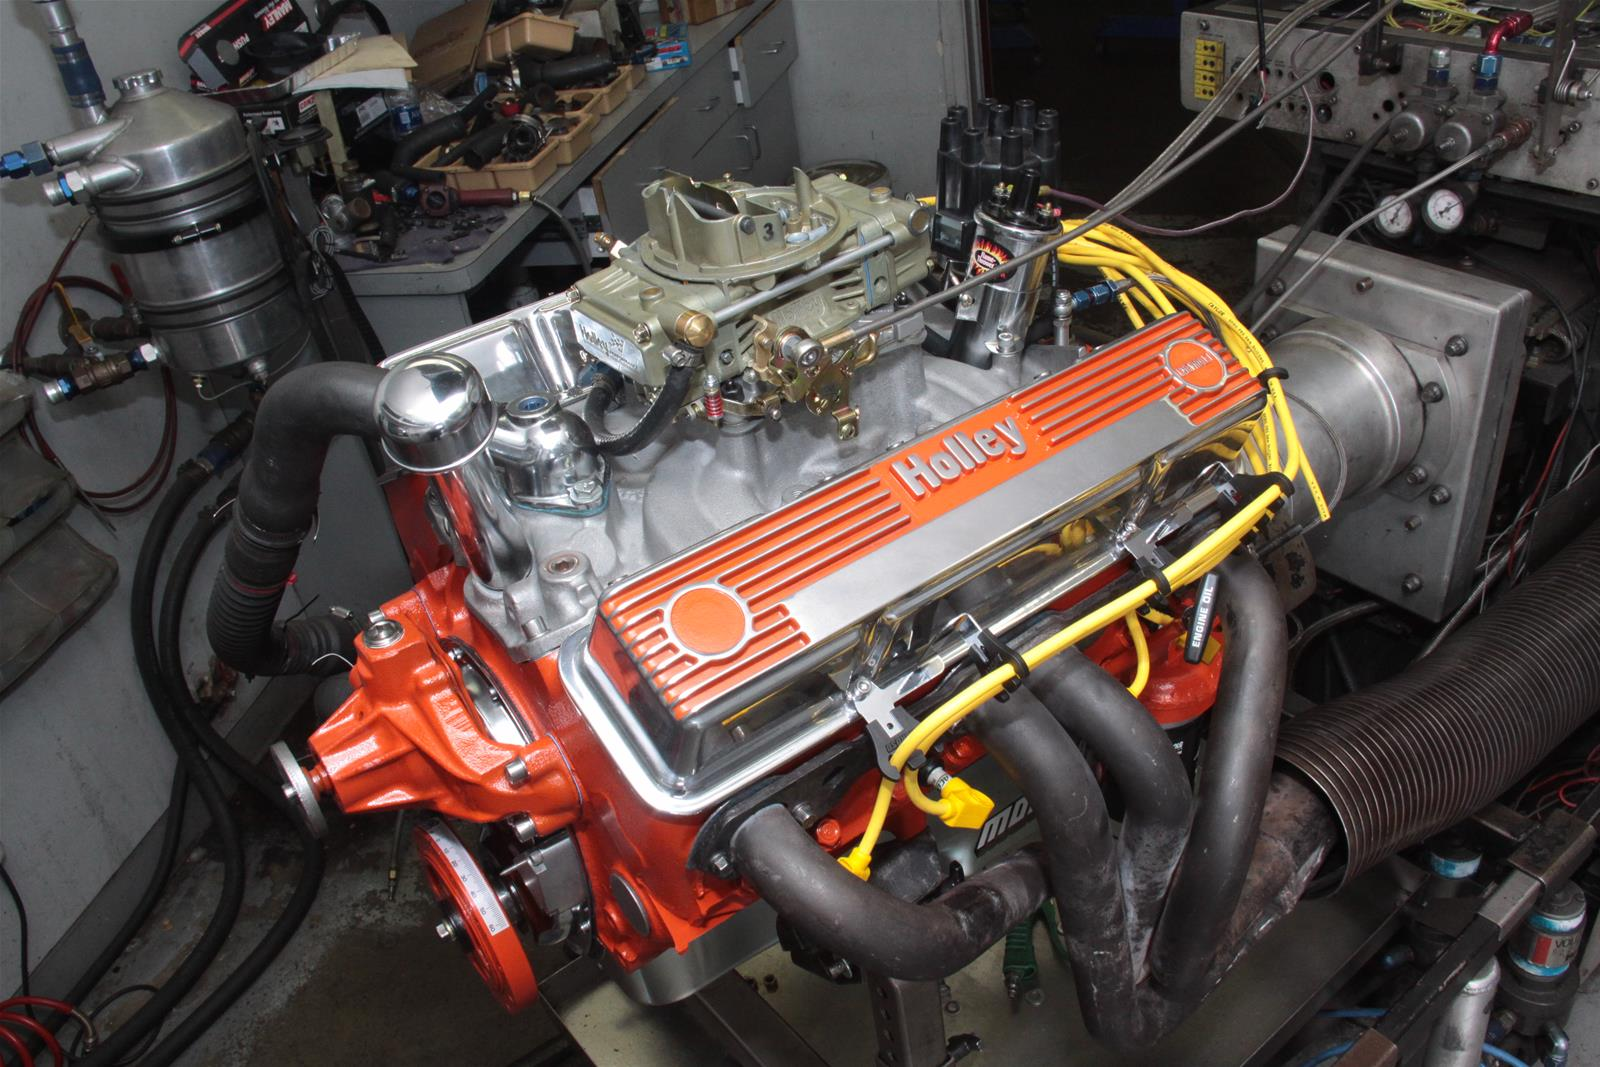 Chevy High Performance >> Chevy High Performance Class Of 68 Chevy 327 Short Block Combos Sum